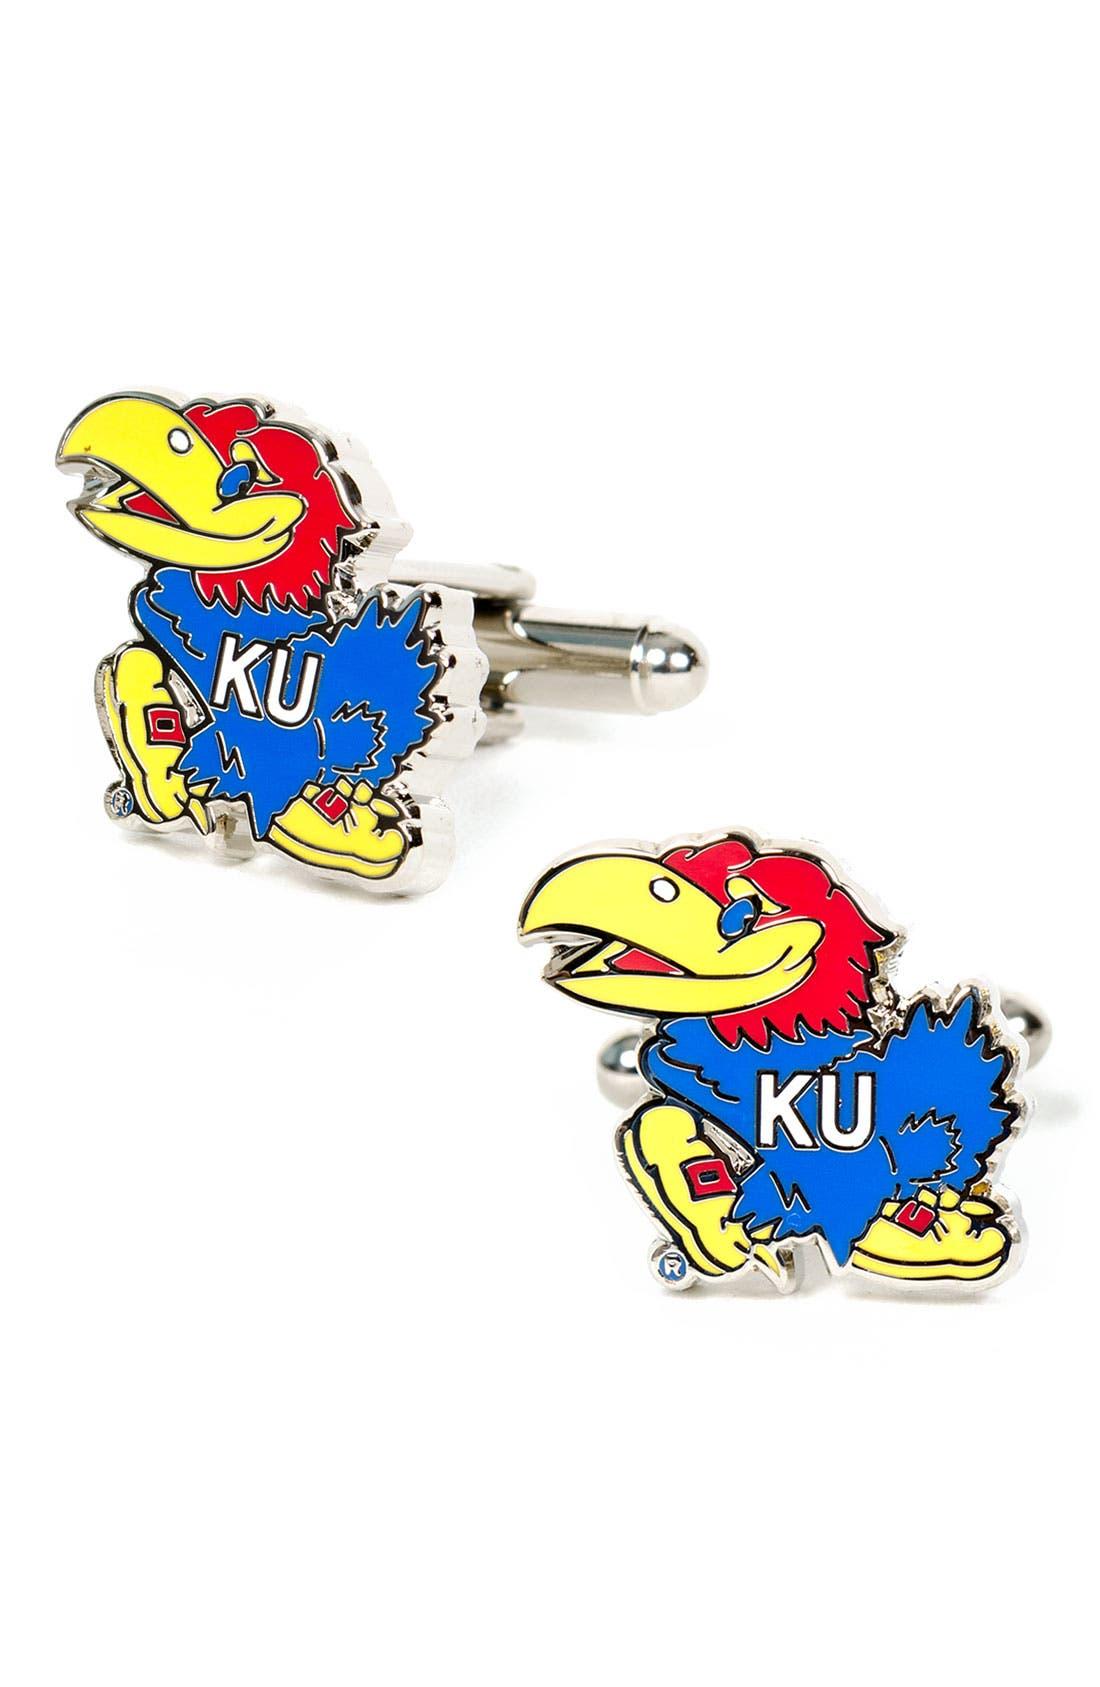 'Kansas Jayhawks' Cuff Links,                         Main,                         color, Blue/ Red/ Gold